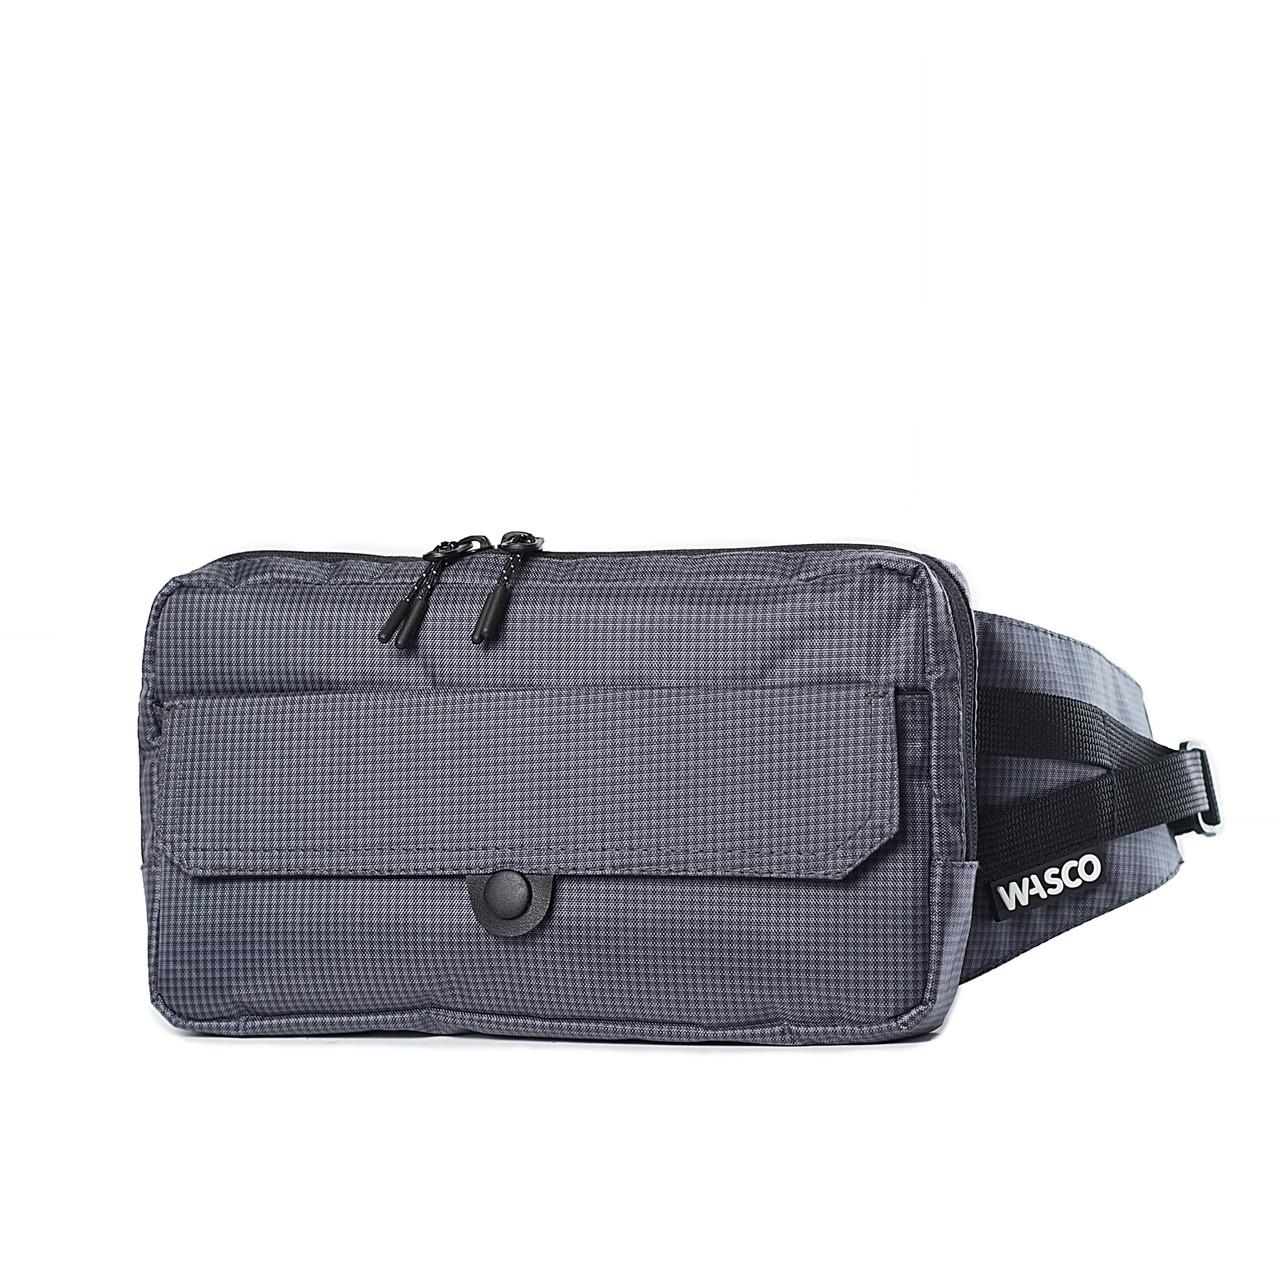 Поясная сумка Wasco G1 Серая